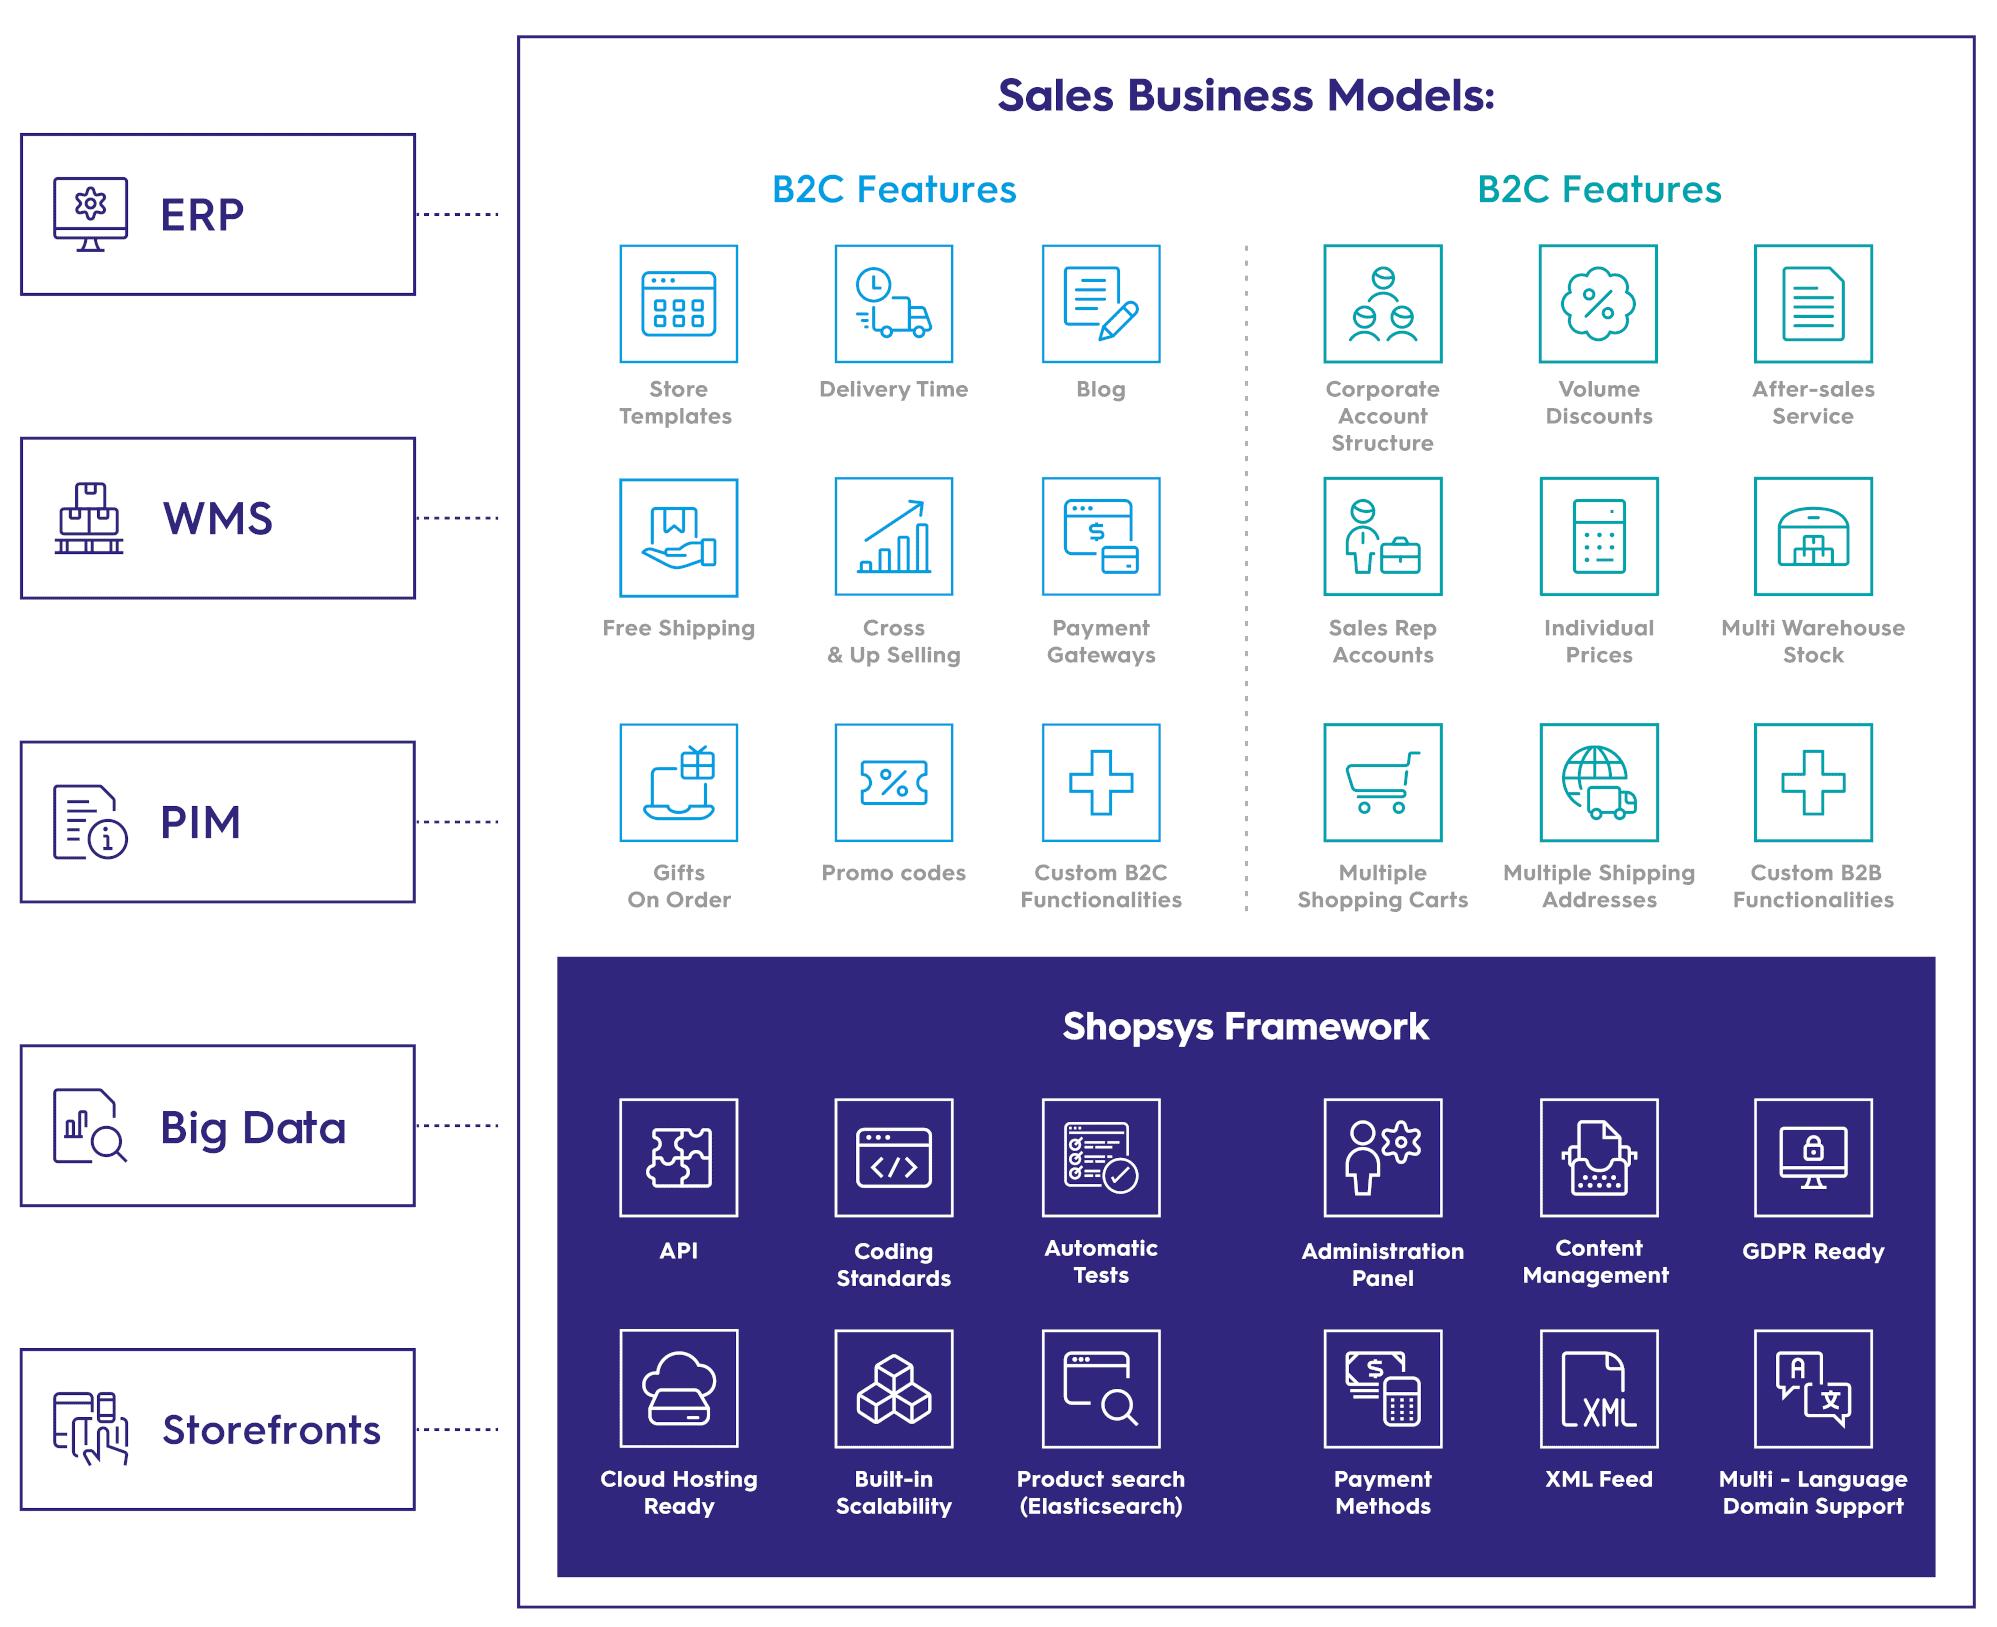 Shopsys Framework Diagram